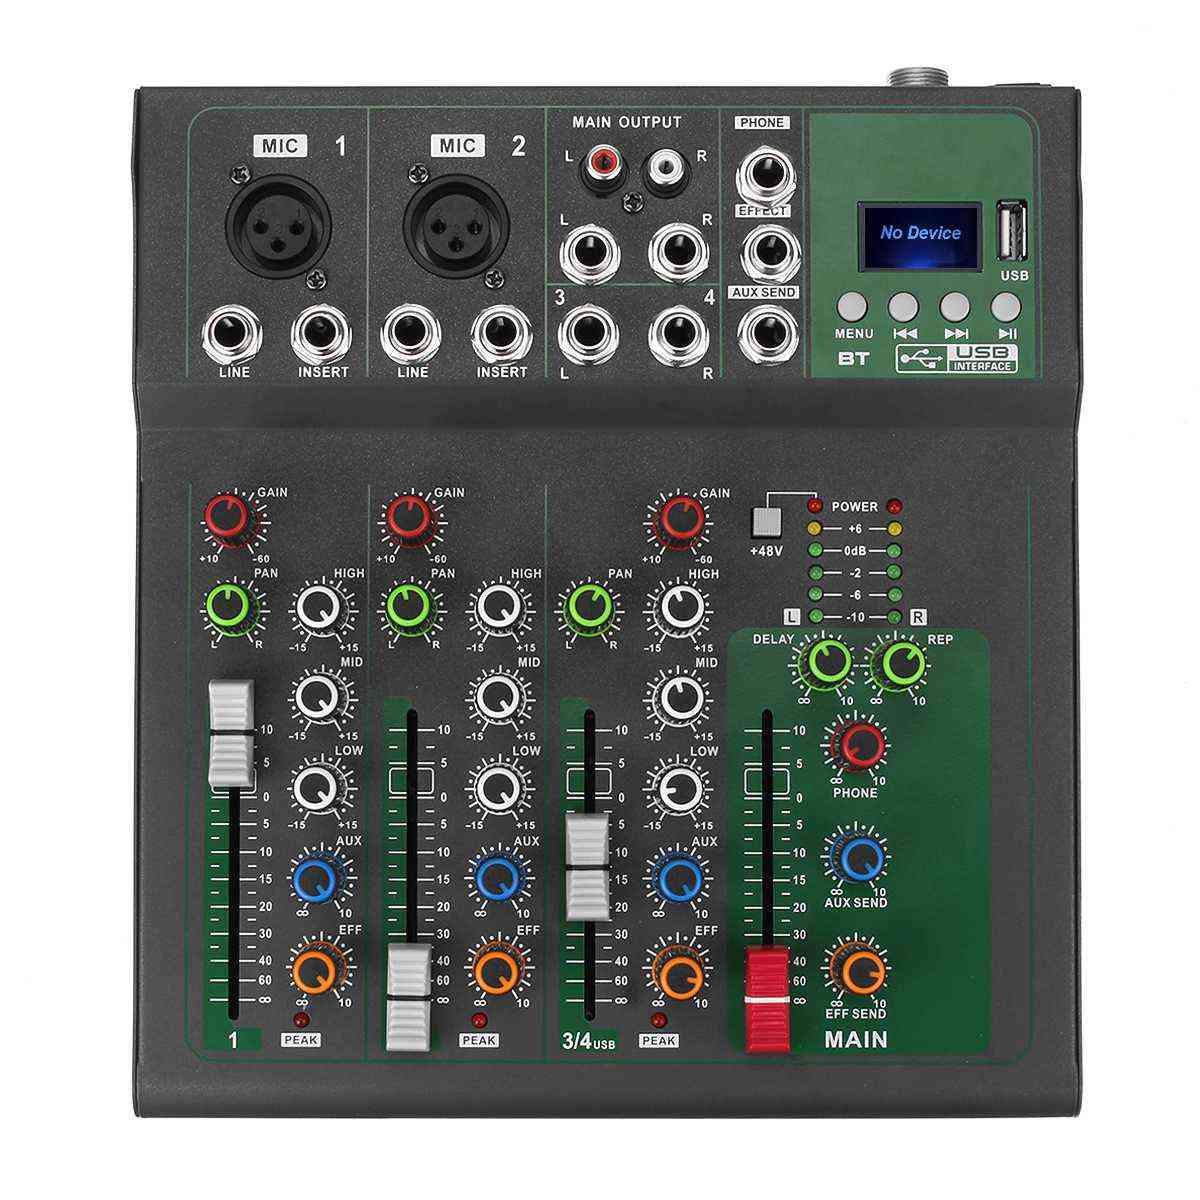 Bluetooth Portable Audio Mixer - Control Led Digital Display Music Stream